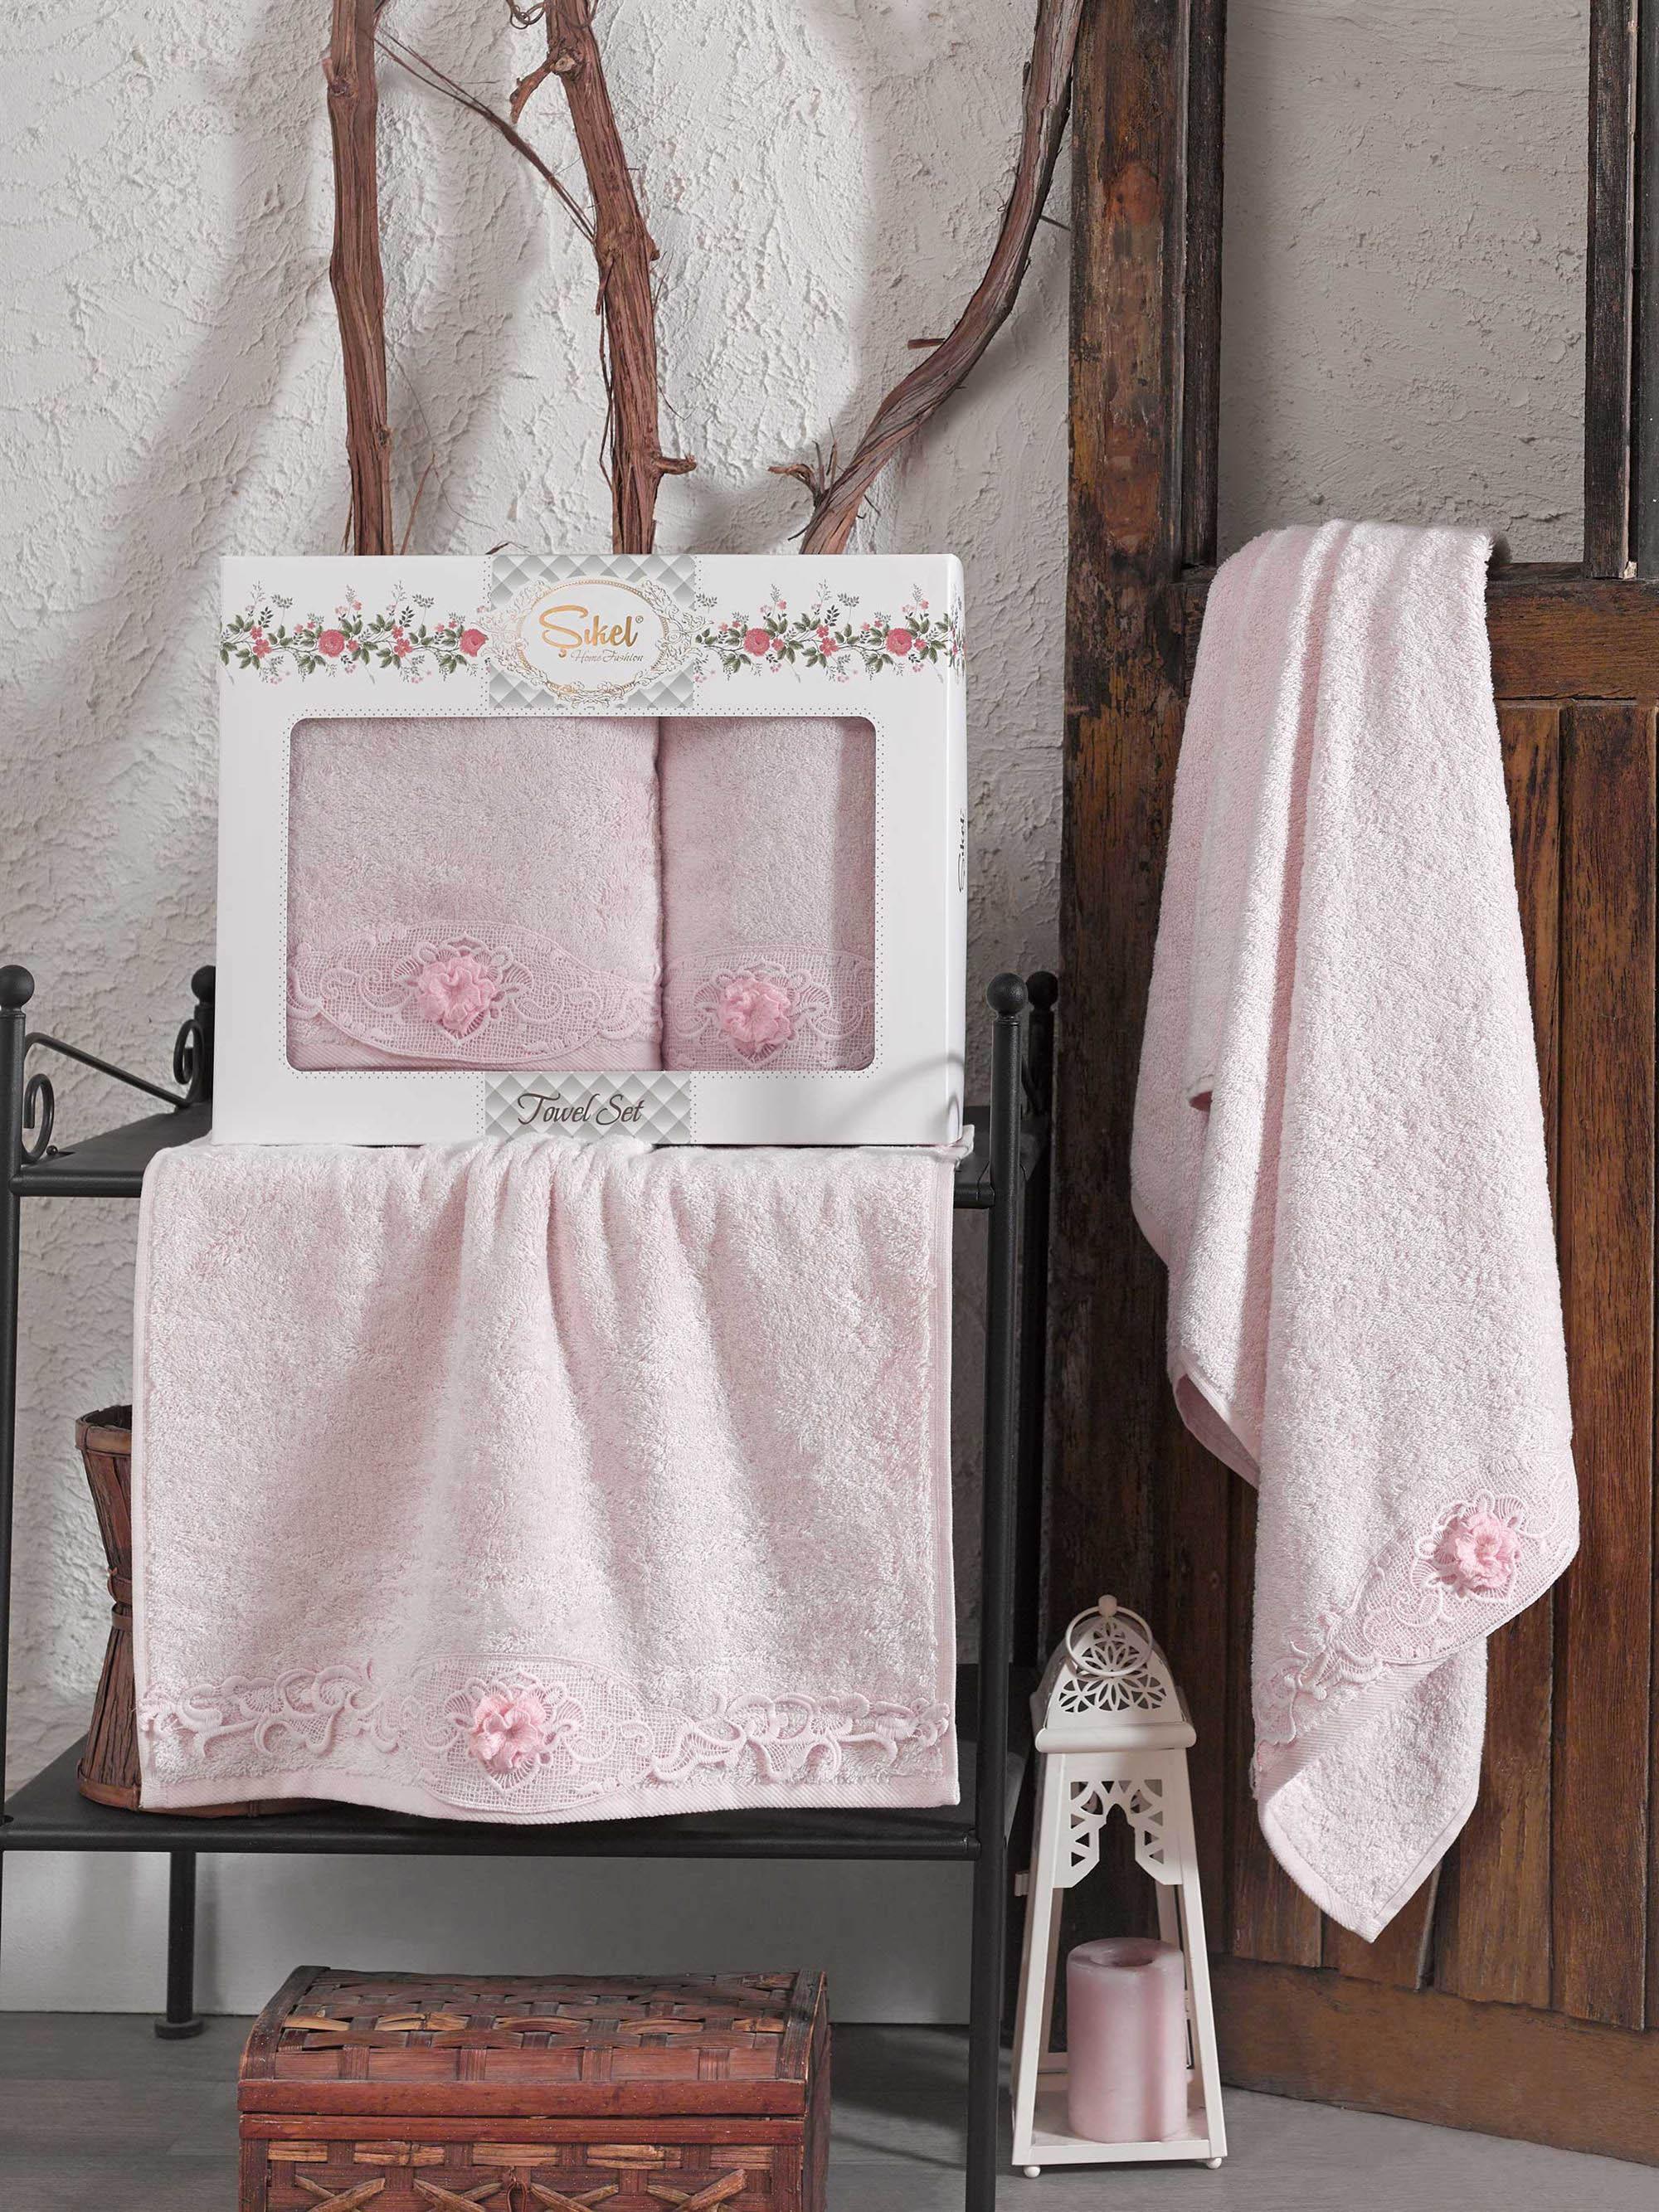 Купить Полотенца Sikel, Полотенце Afrodit Цвет: Розовый (50х90 см, 70х140 см), Турция, Бамбук